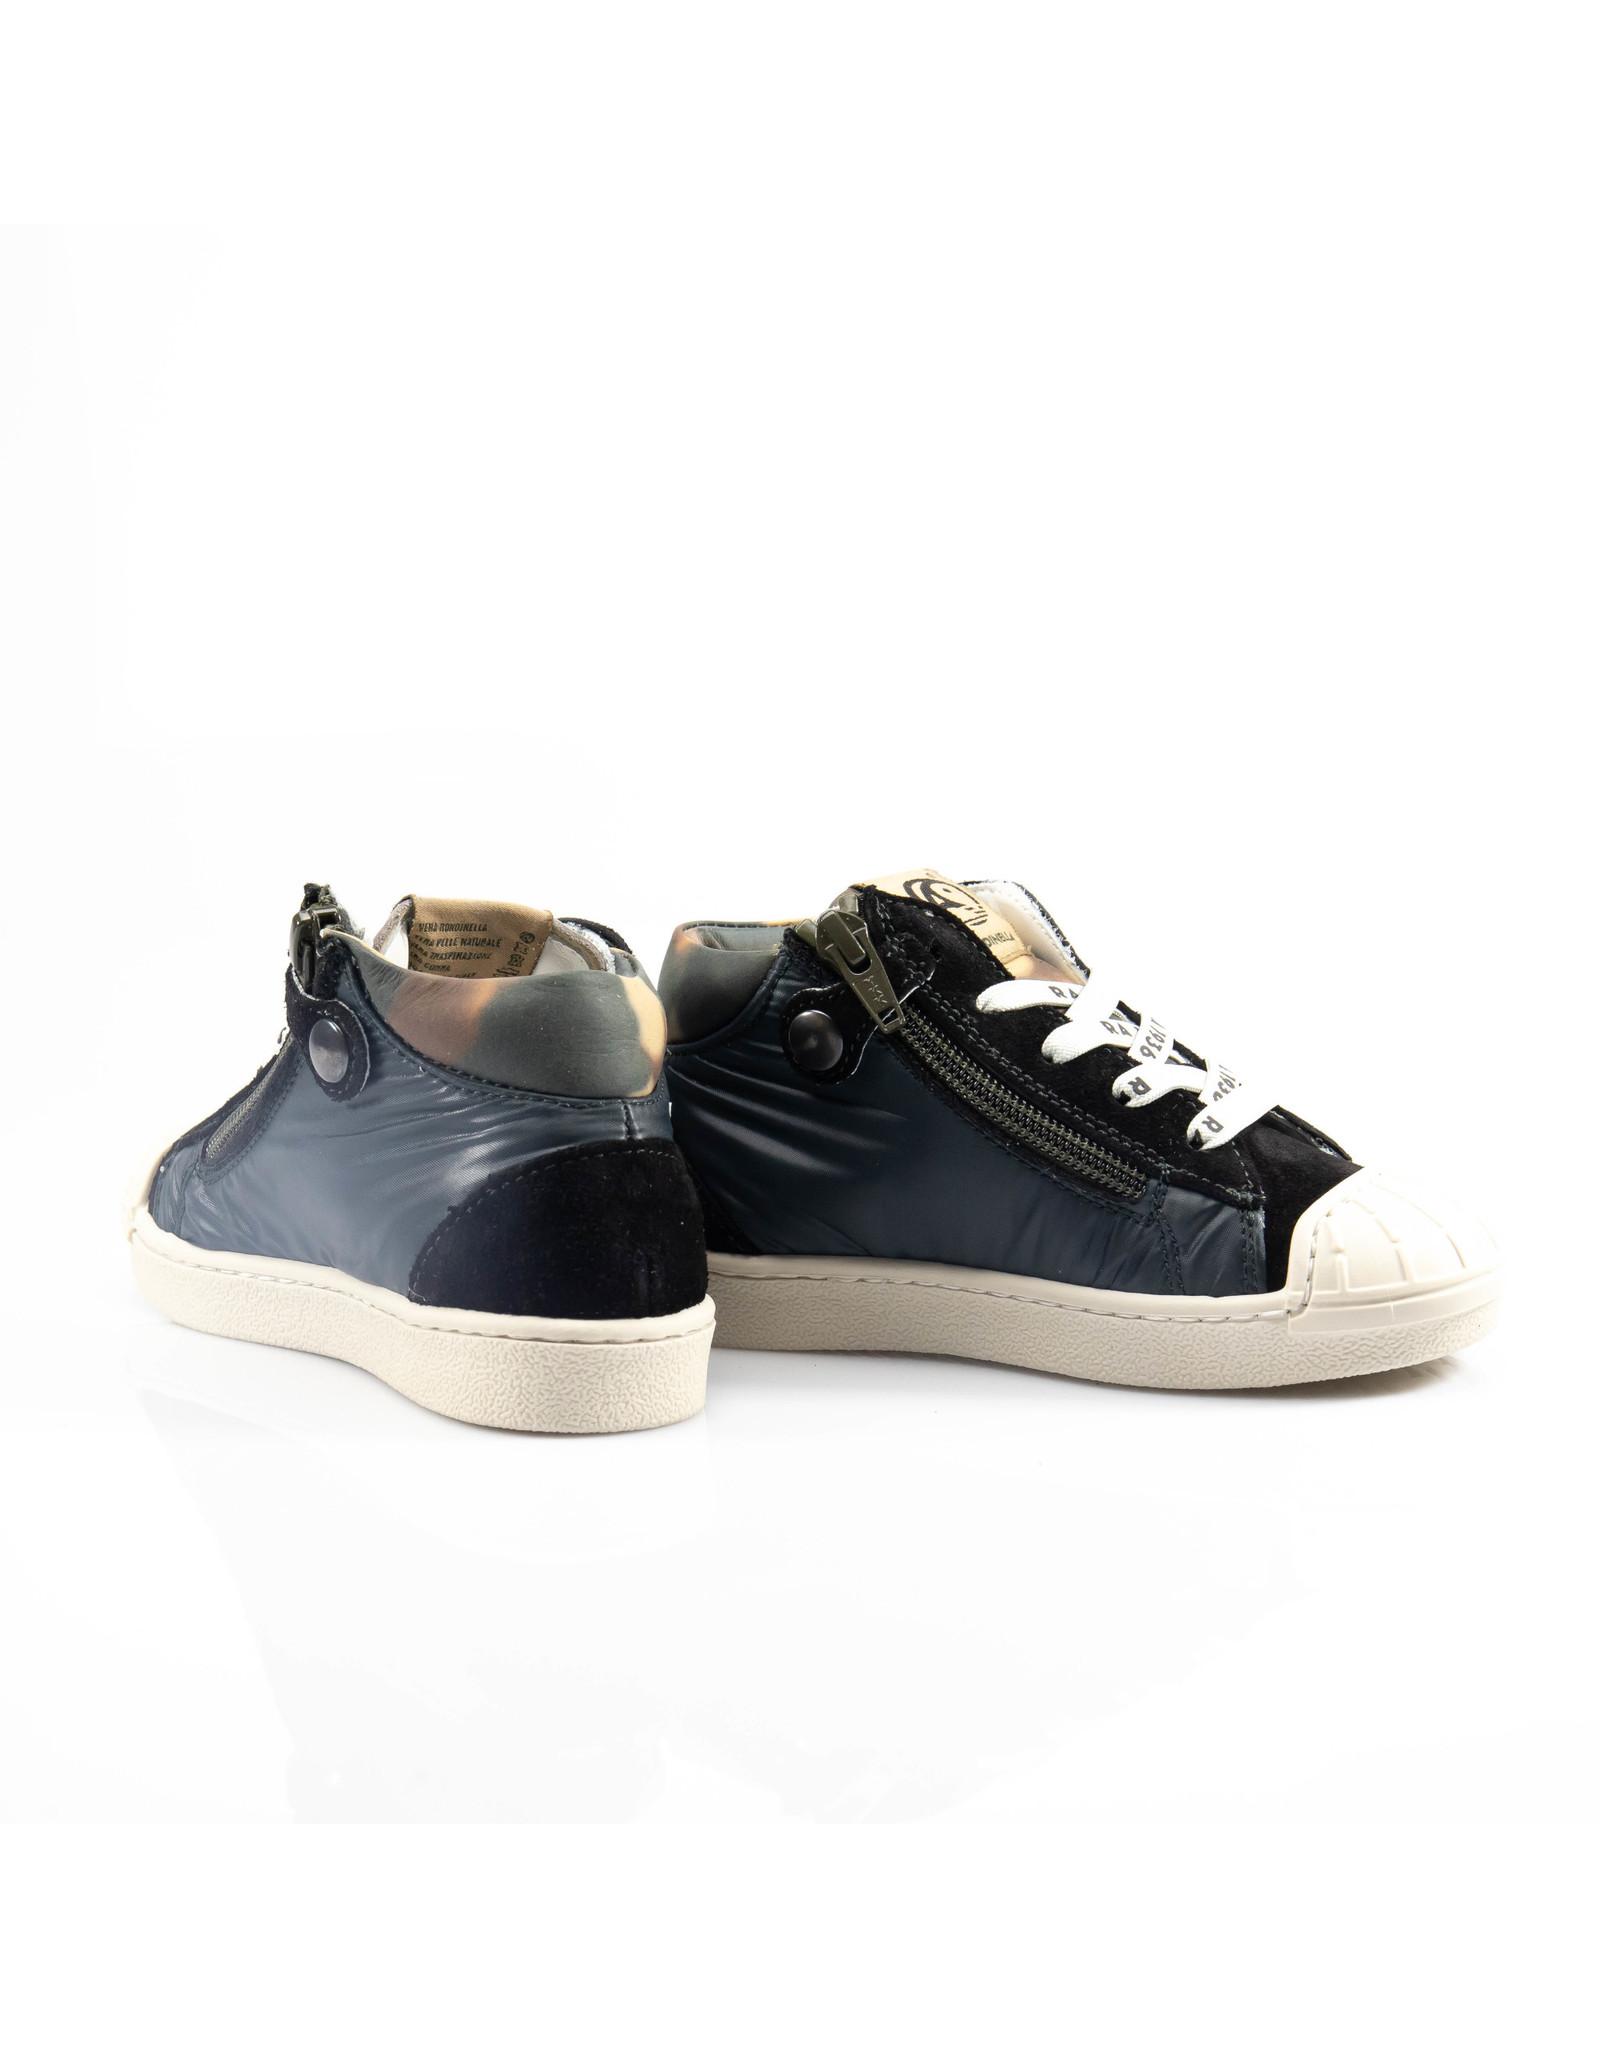 Rondinella hoge sneaker nubuck zwart, witte ster